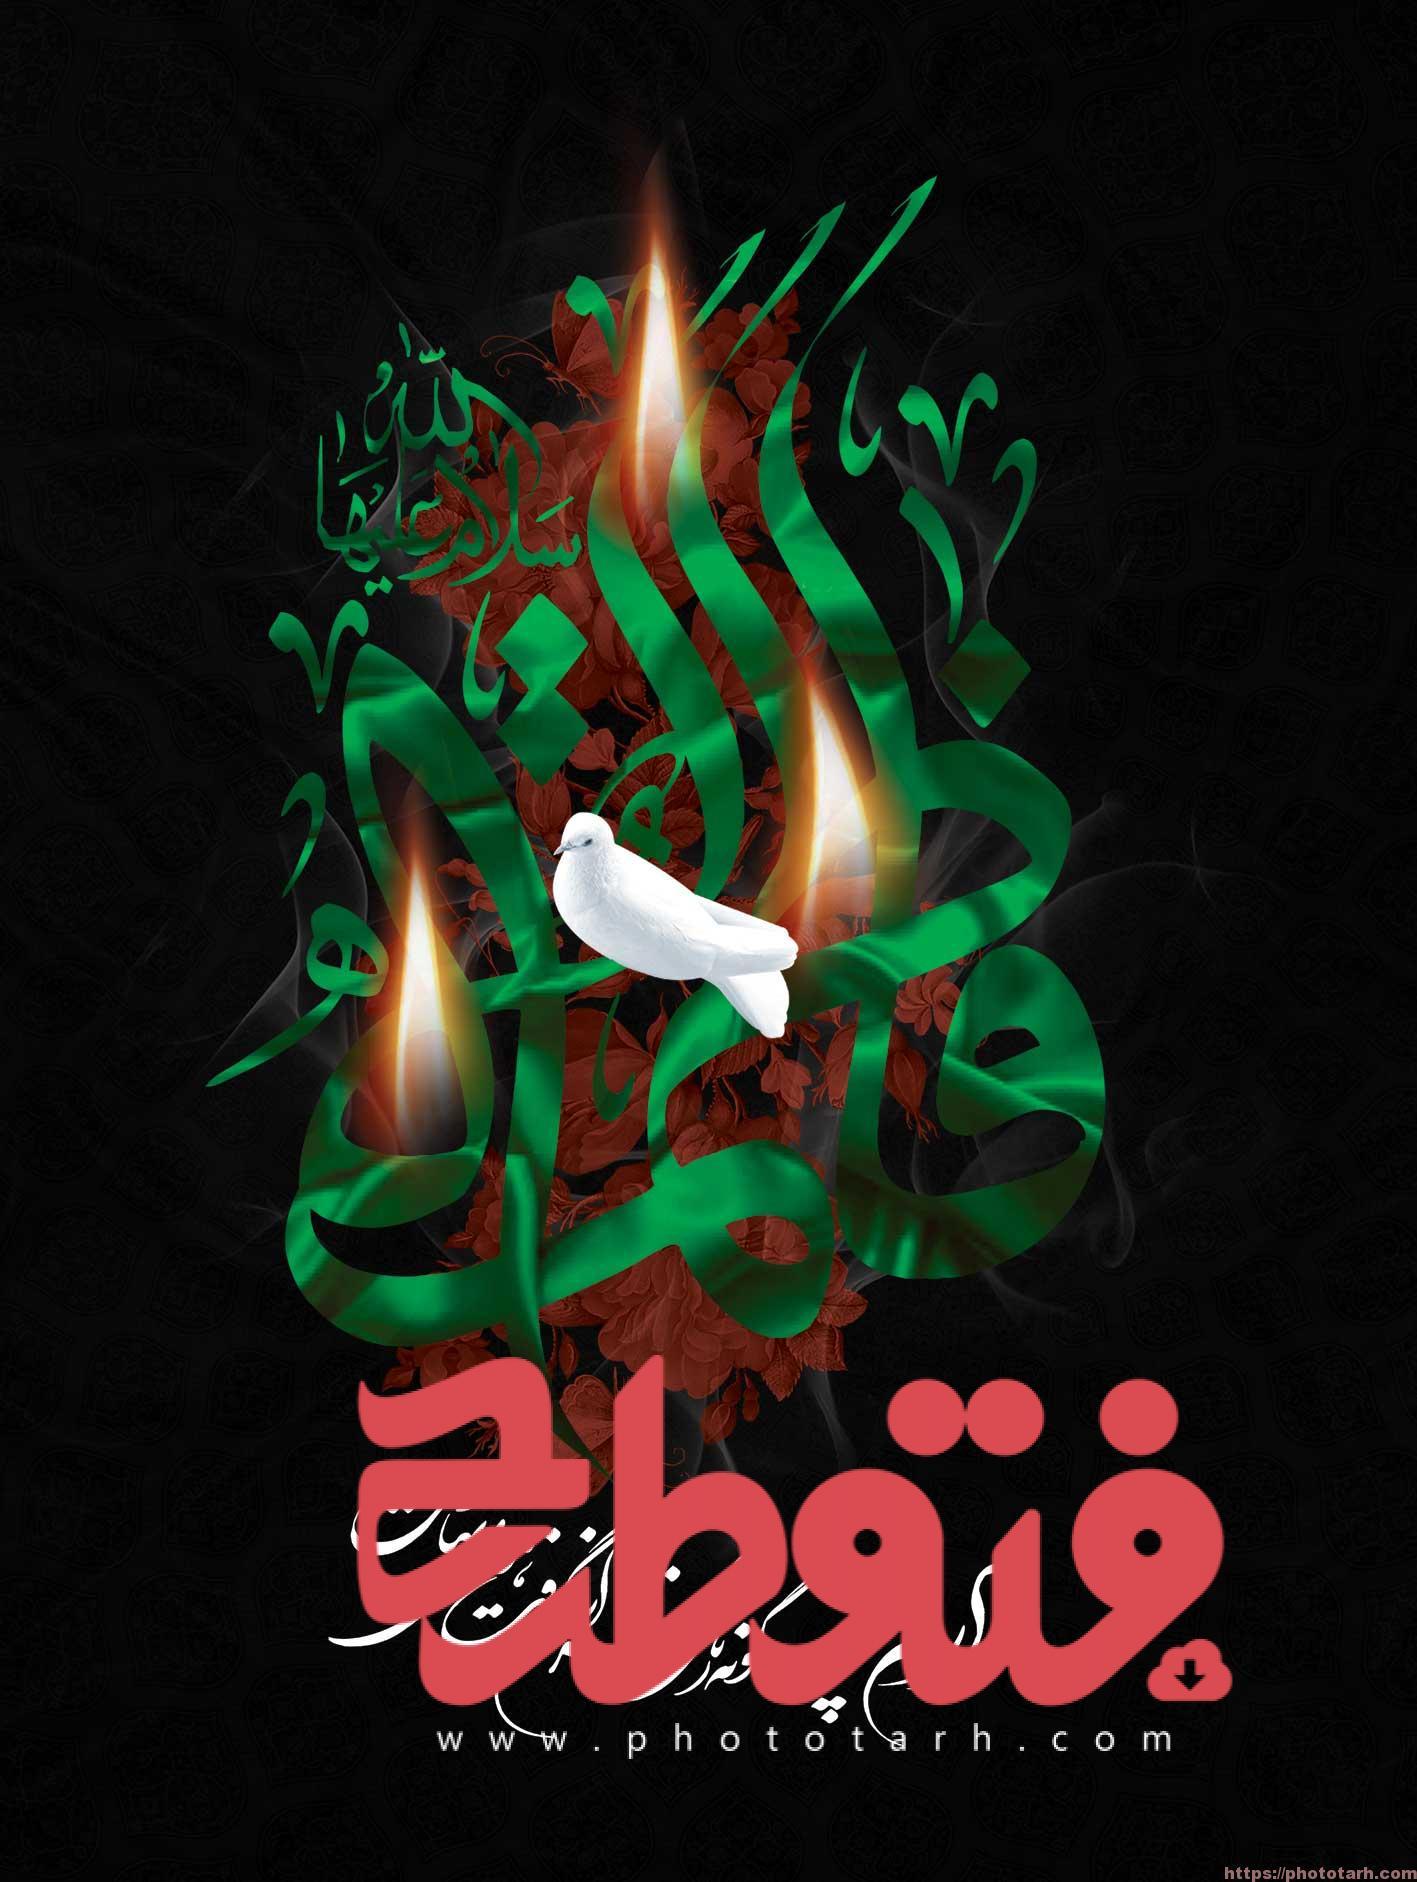 Af948 - طرح لایه باز ایام فاطمیه